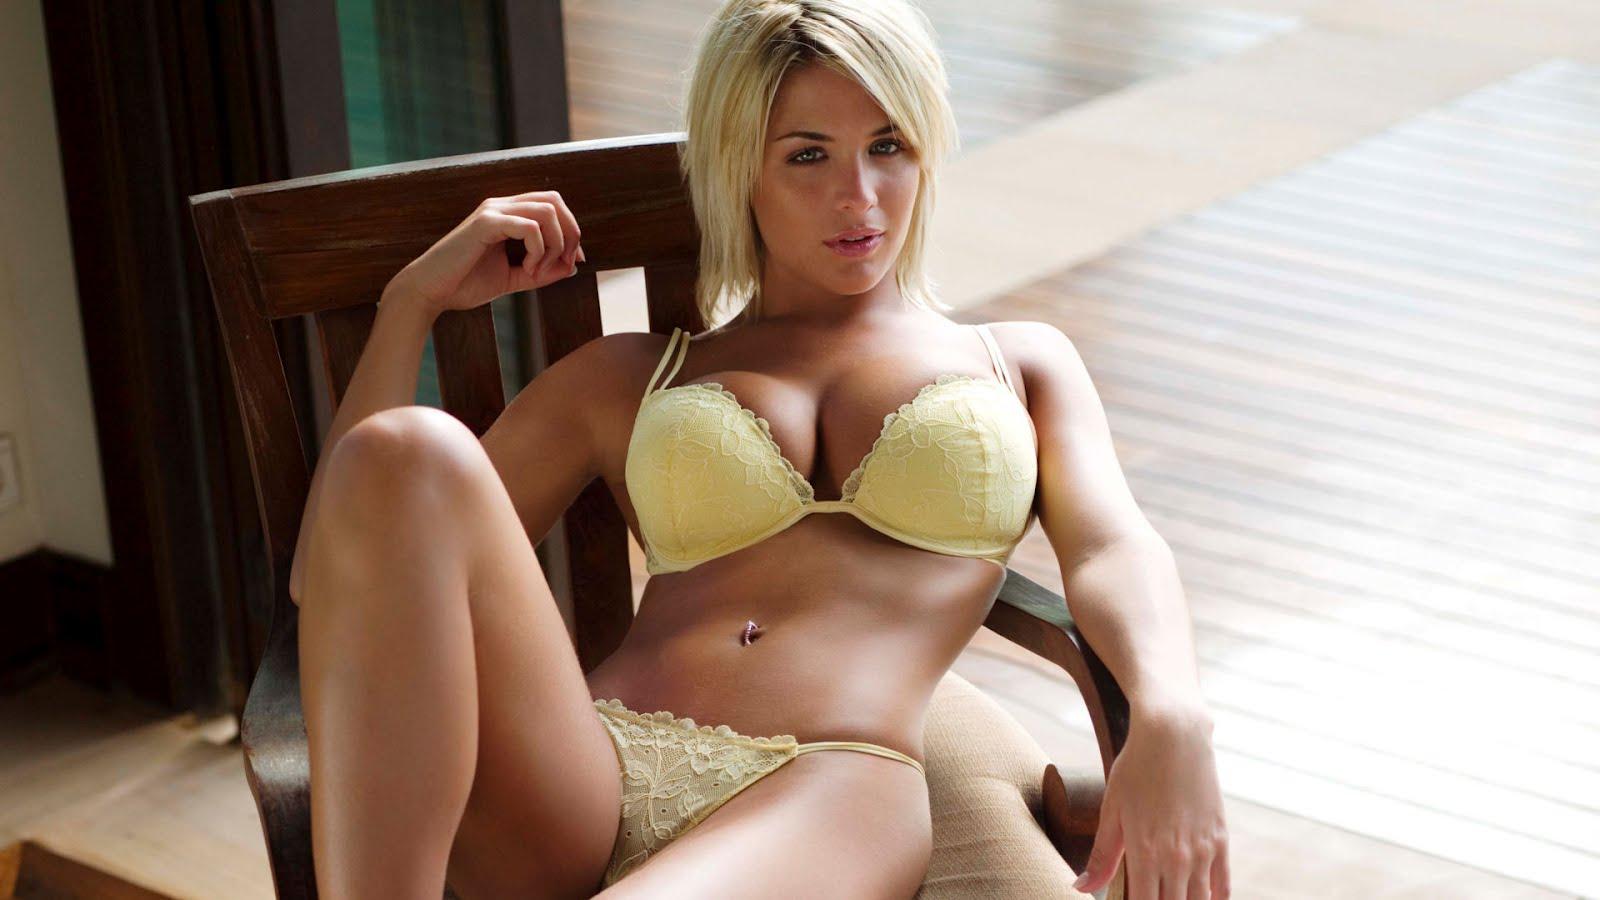 hottest women | meredith alexander